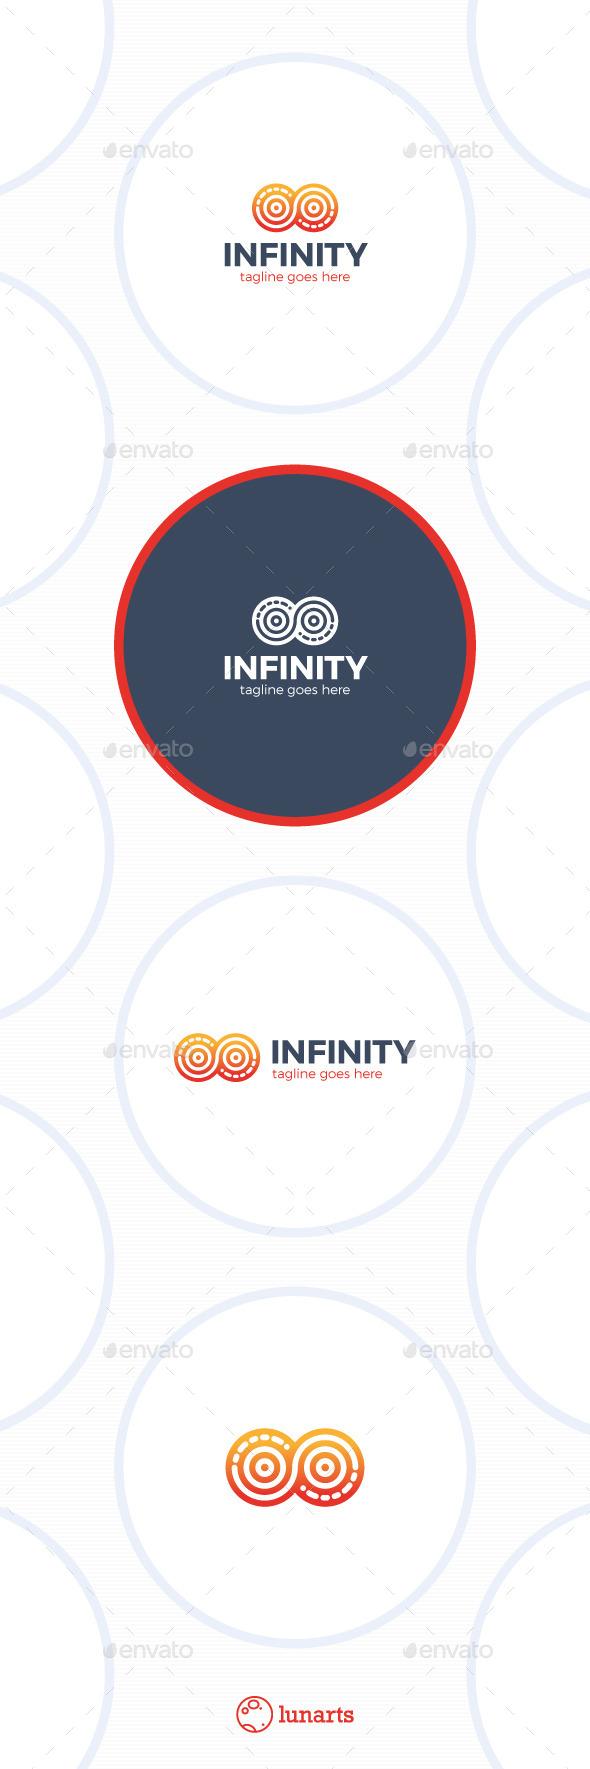 Infinity Circle Logo - Abstract Logo Templates